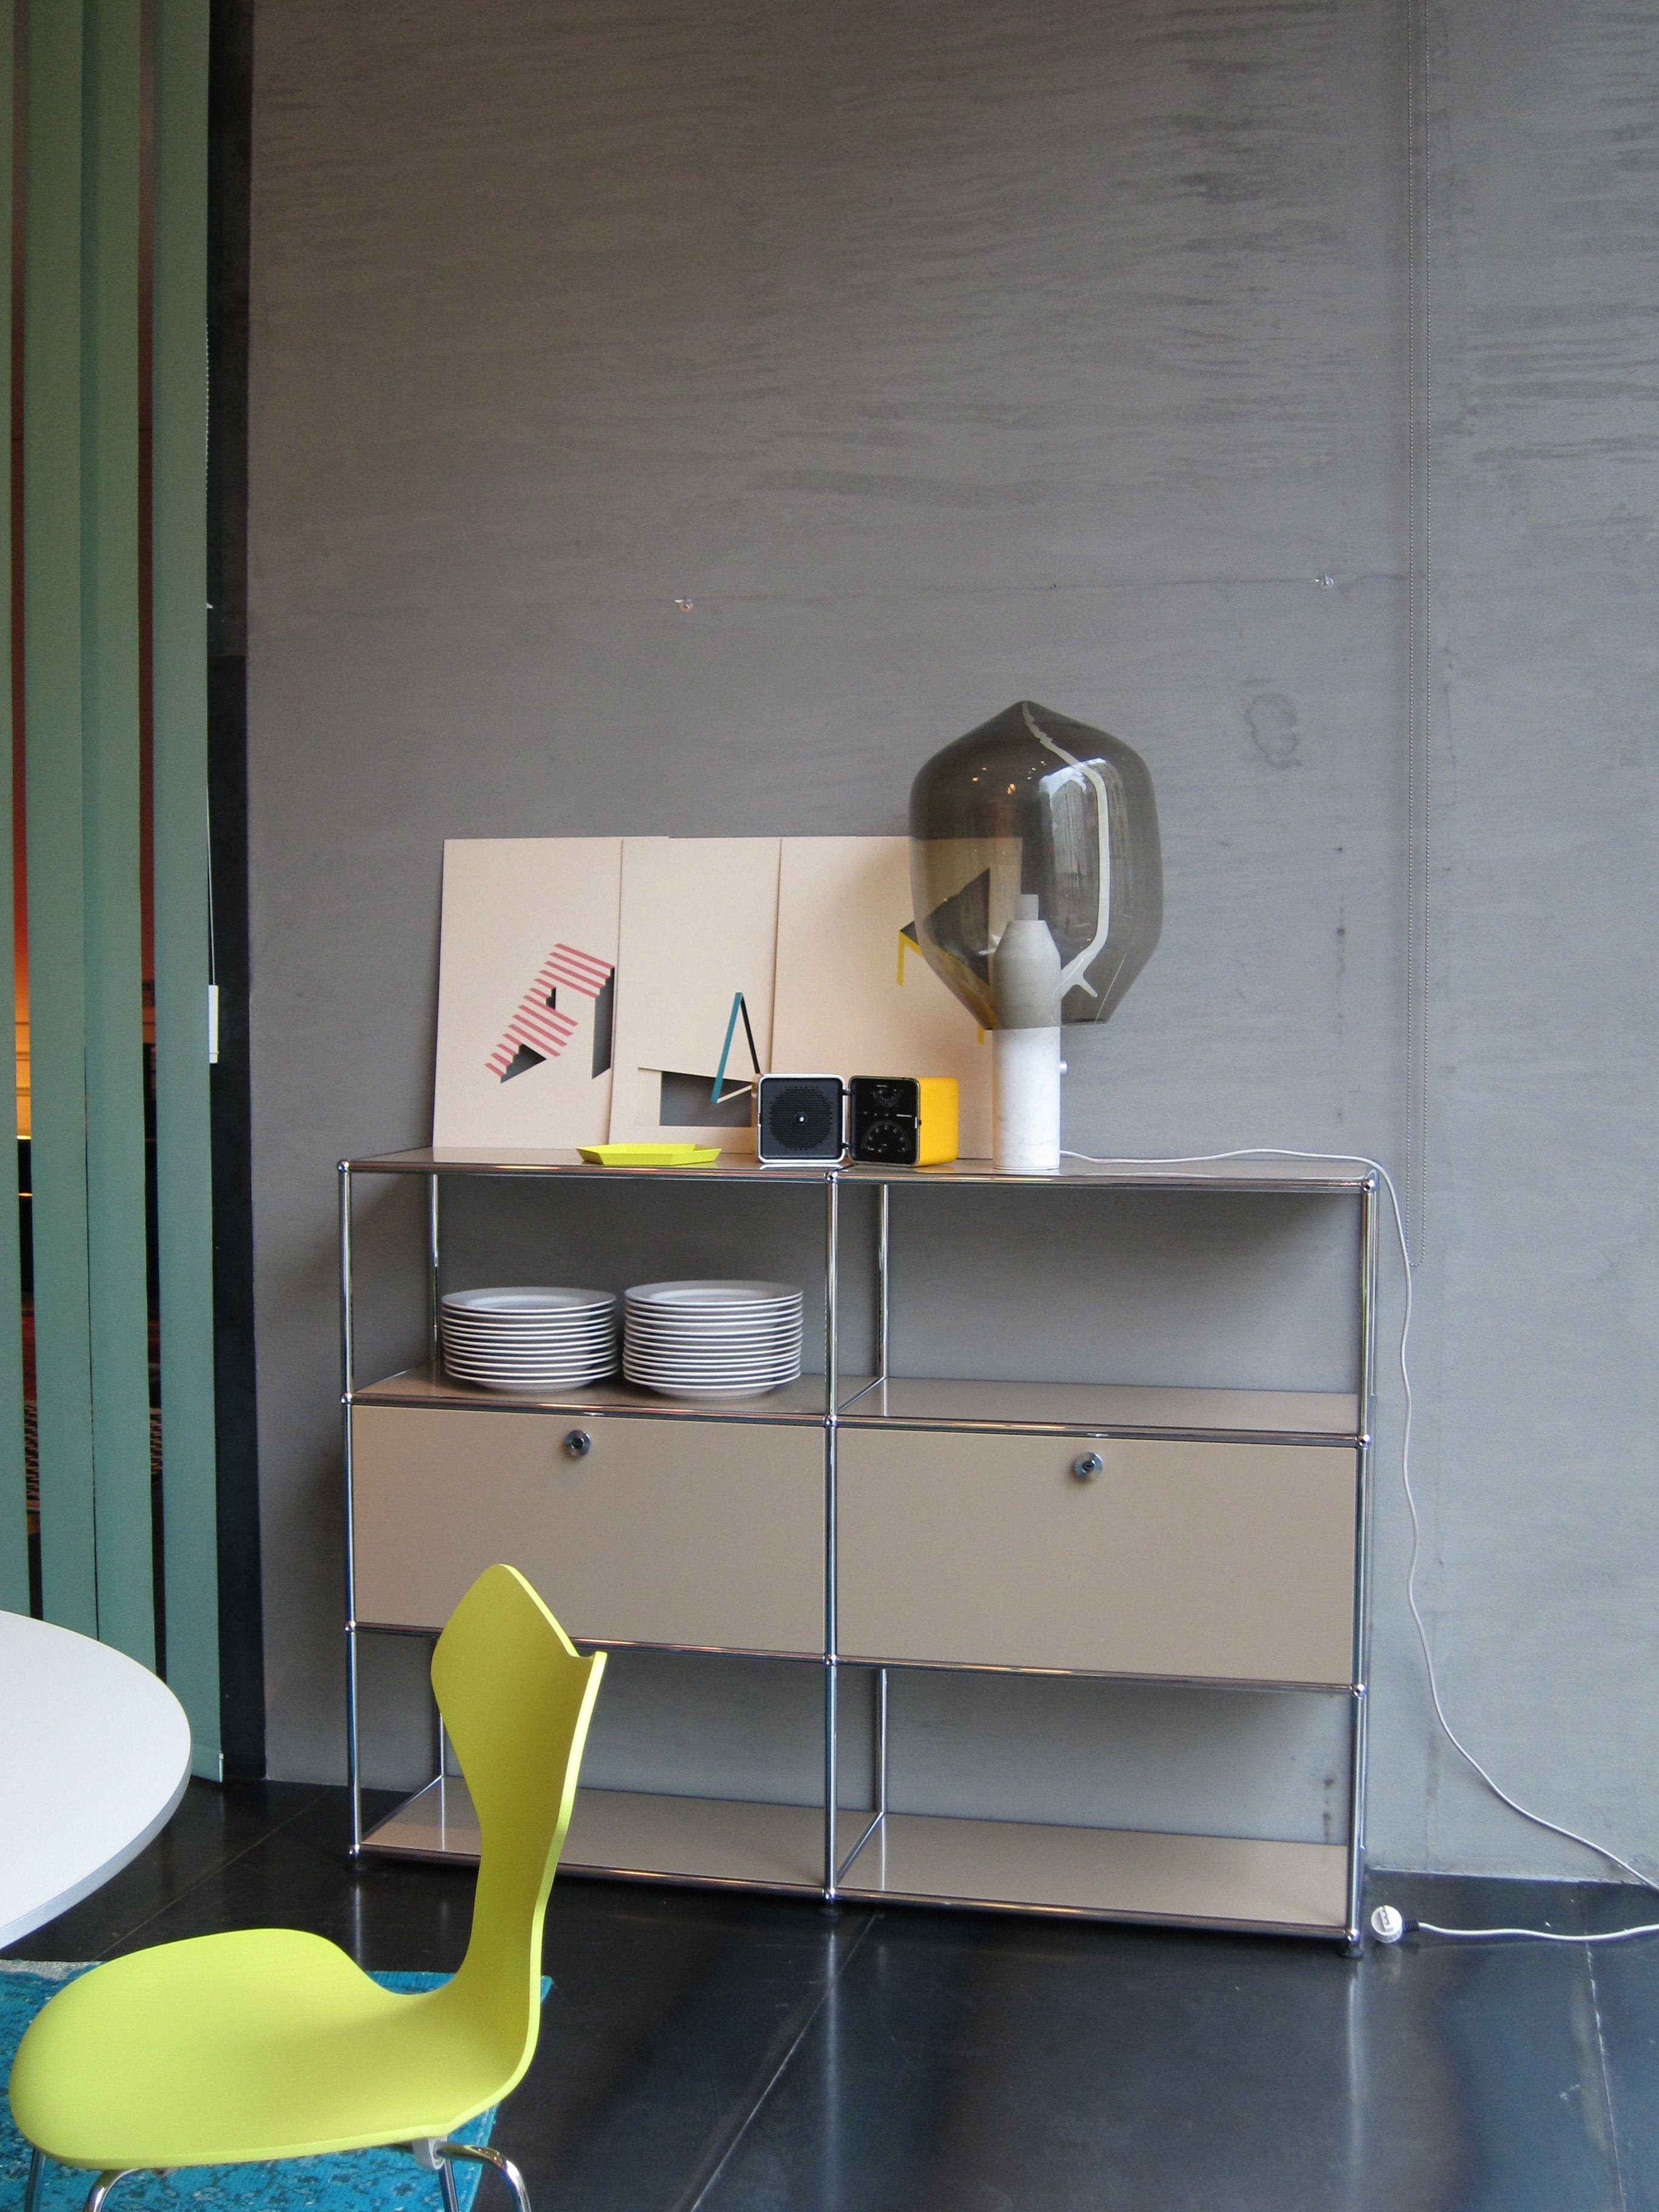 NEW Summer 2012 Setup | Objects/Furniture/Muebles | Pinterest ...